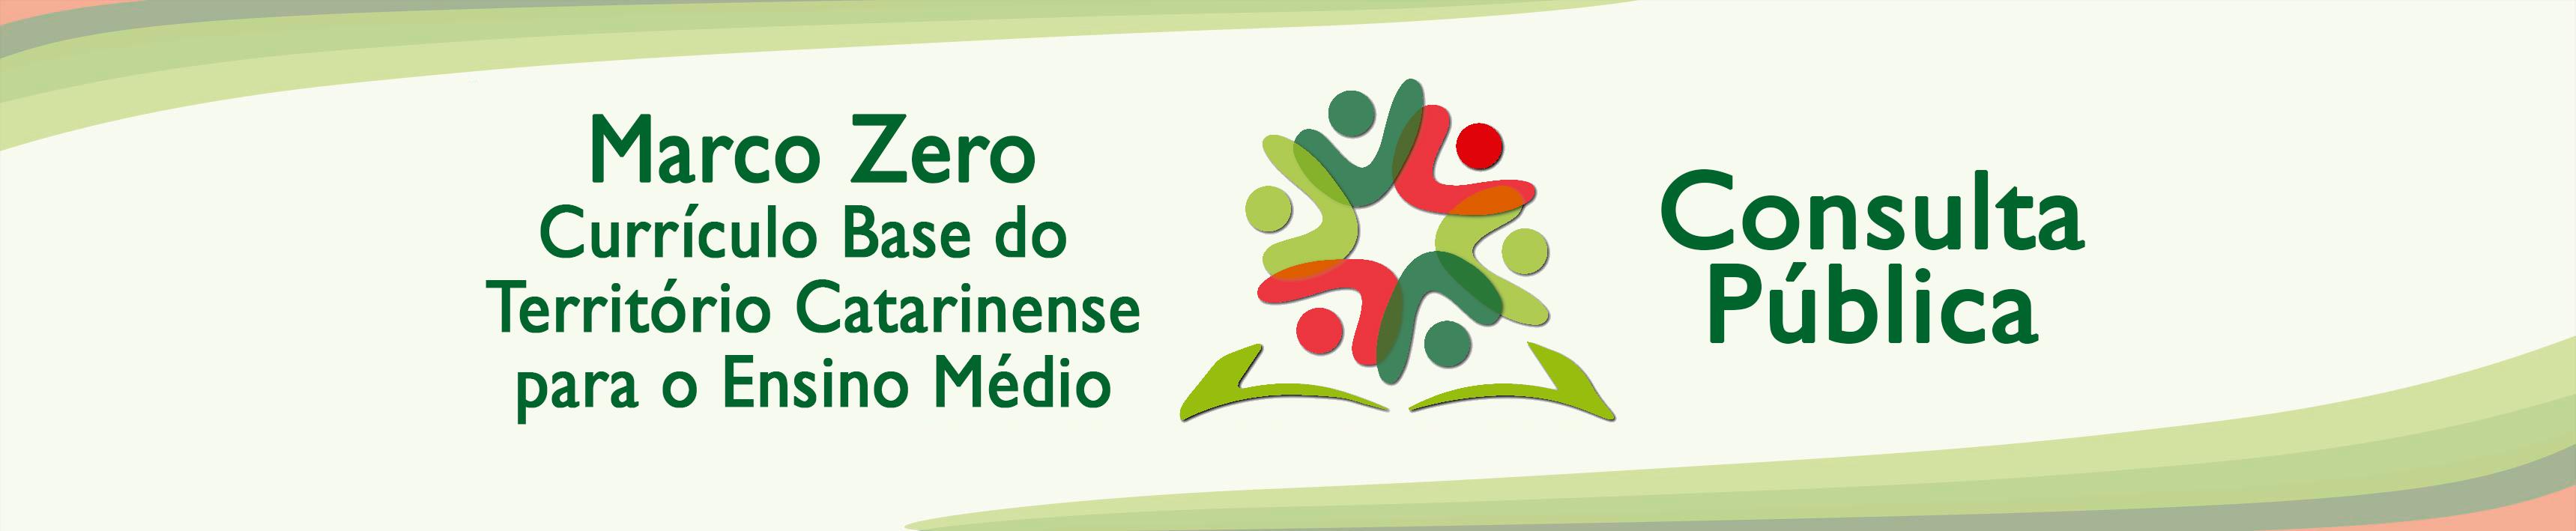 Consullta-pblica---Banner_Prancheta-1